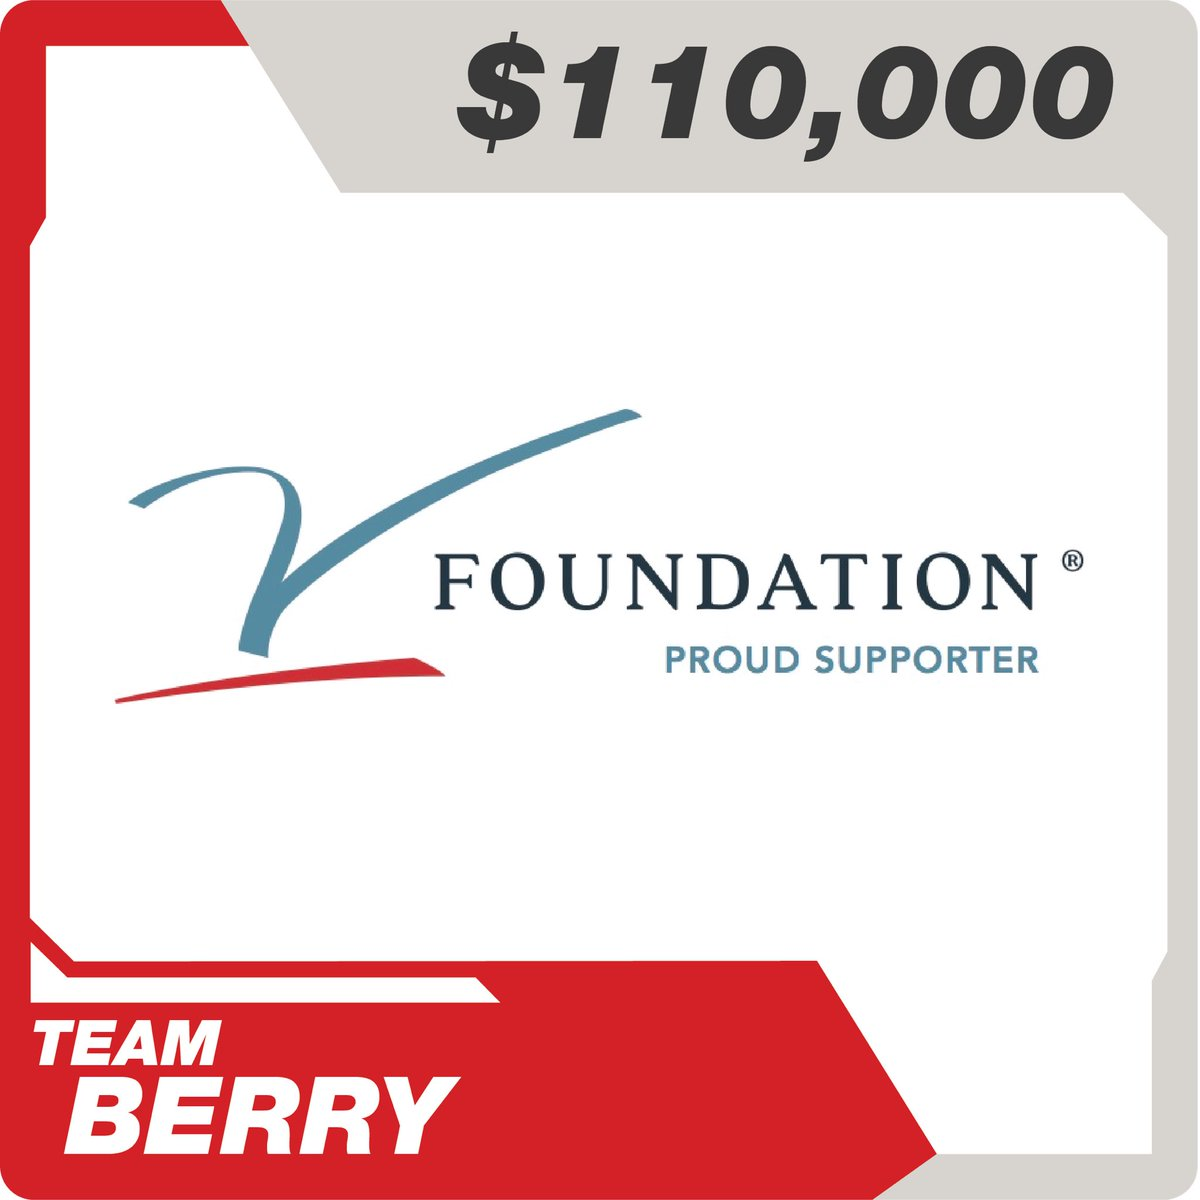 #TeamBerry @MatthewBerryTMR @TheVFoundation